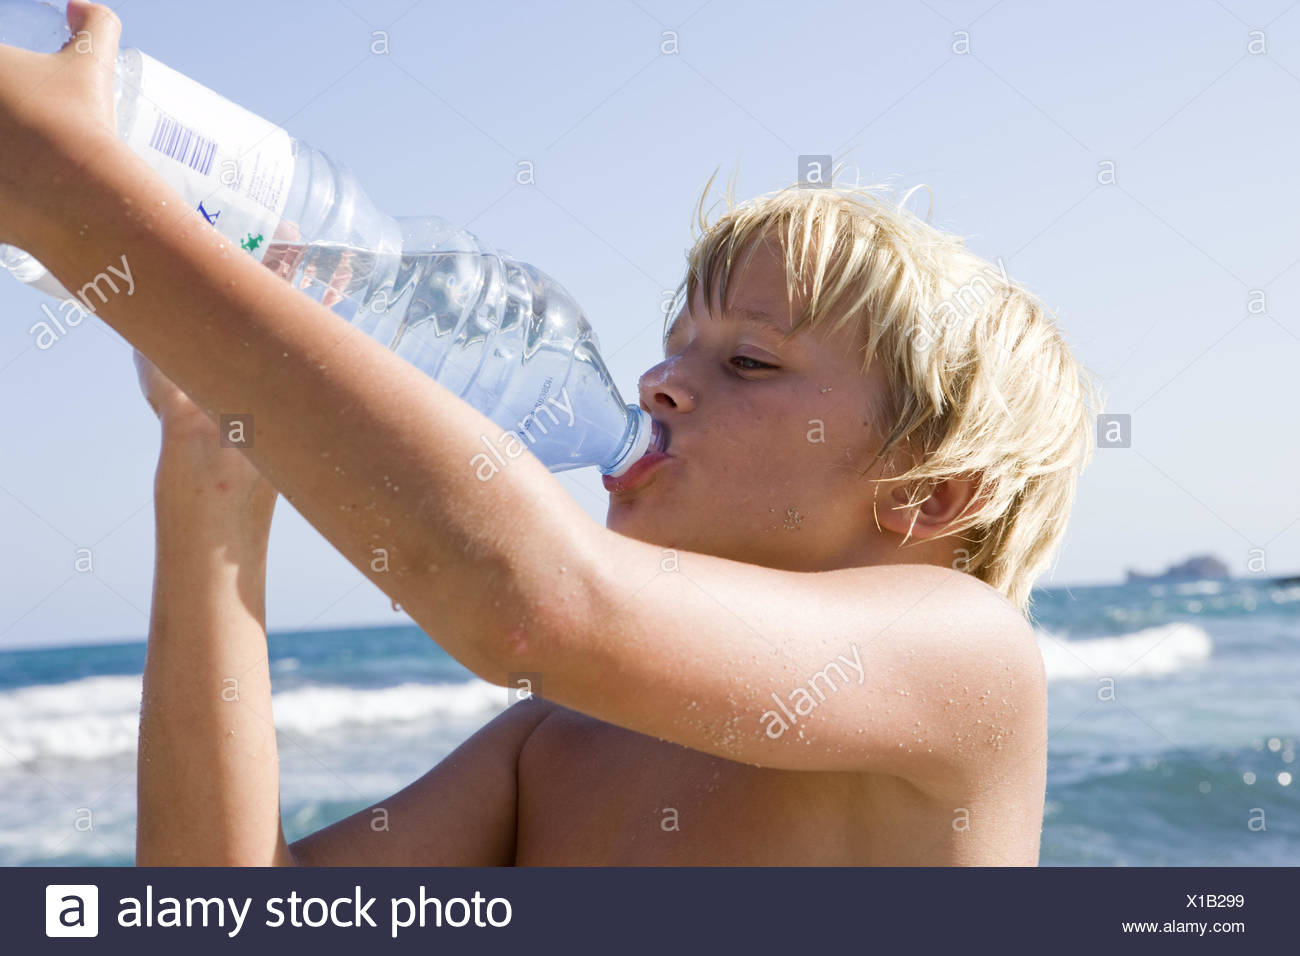 Beach, boy, thirsty, water Bottle, drink, portrait, side view, people, children, blond, summer holidays, holidays, sunny, heat, hotly, thirst, drink, Bottle, water, sea, thirst quencher, mineral water, - Stock Image